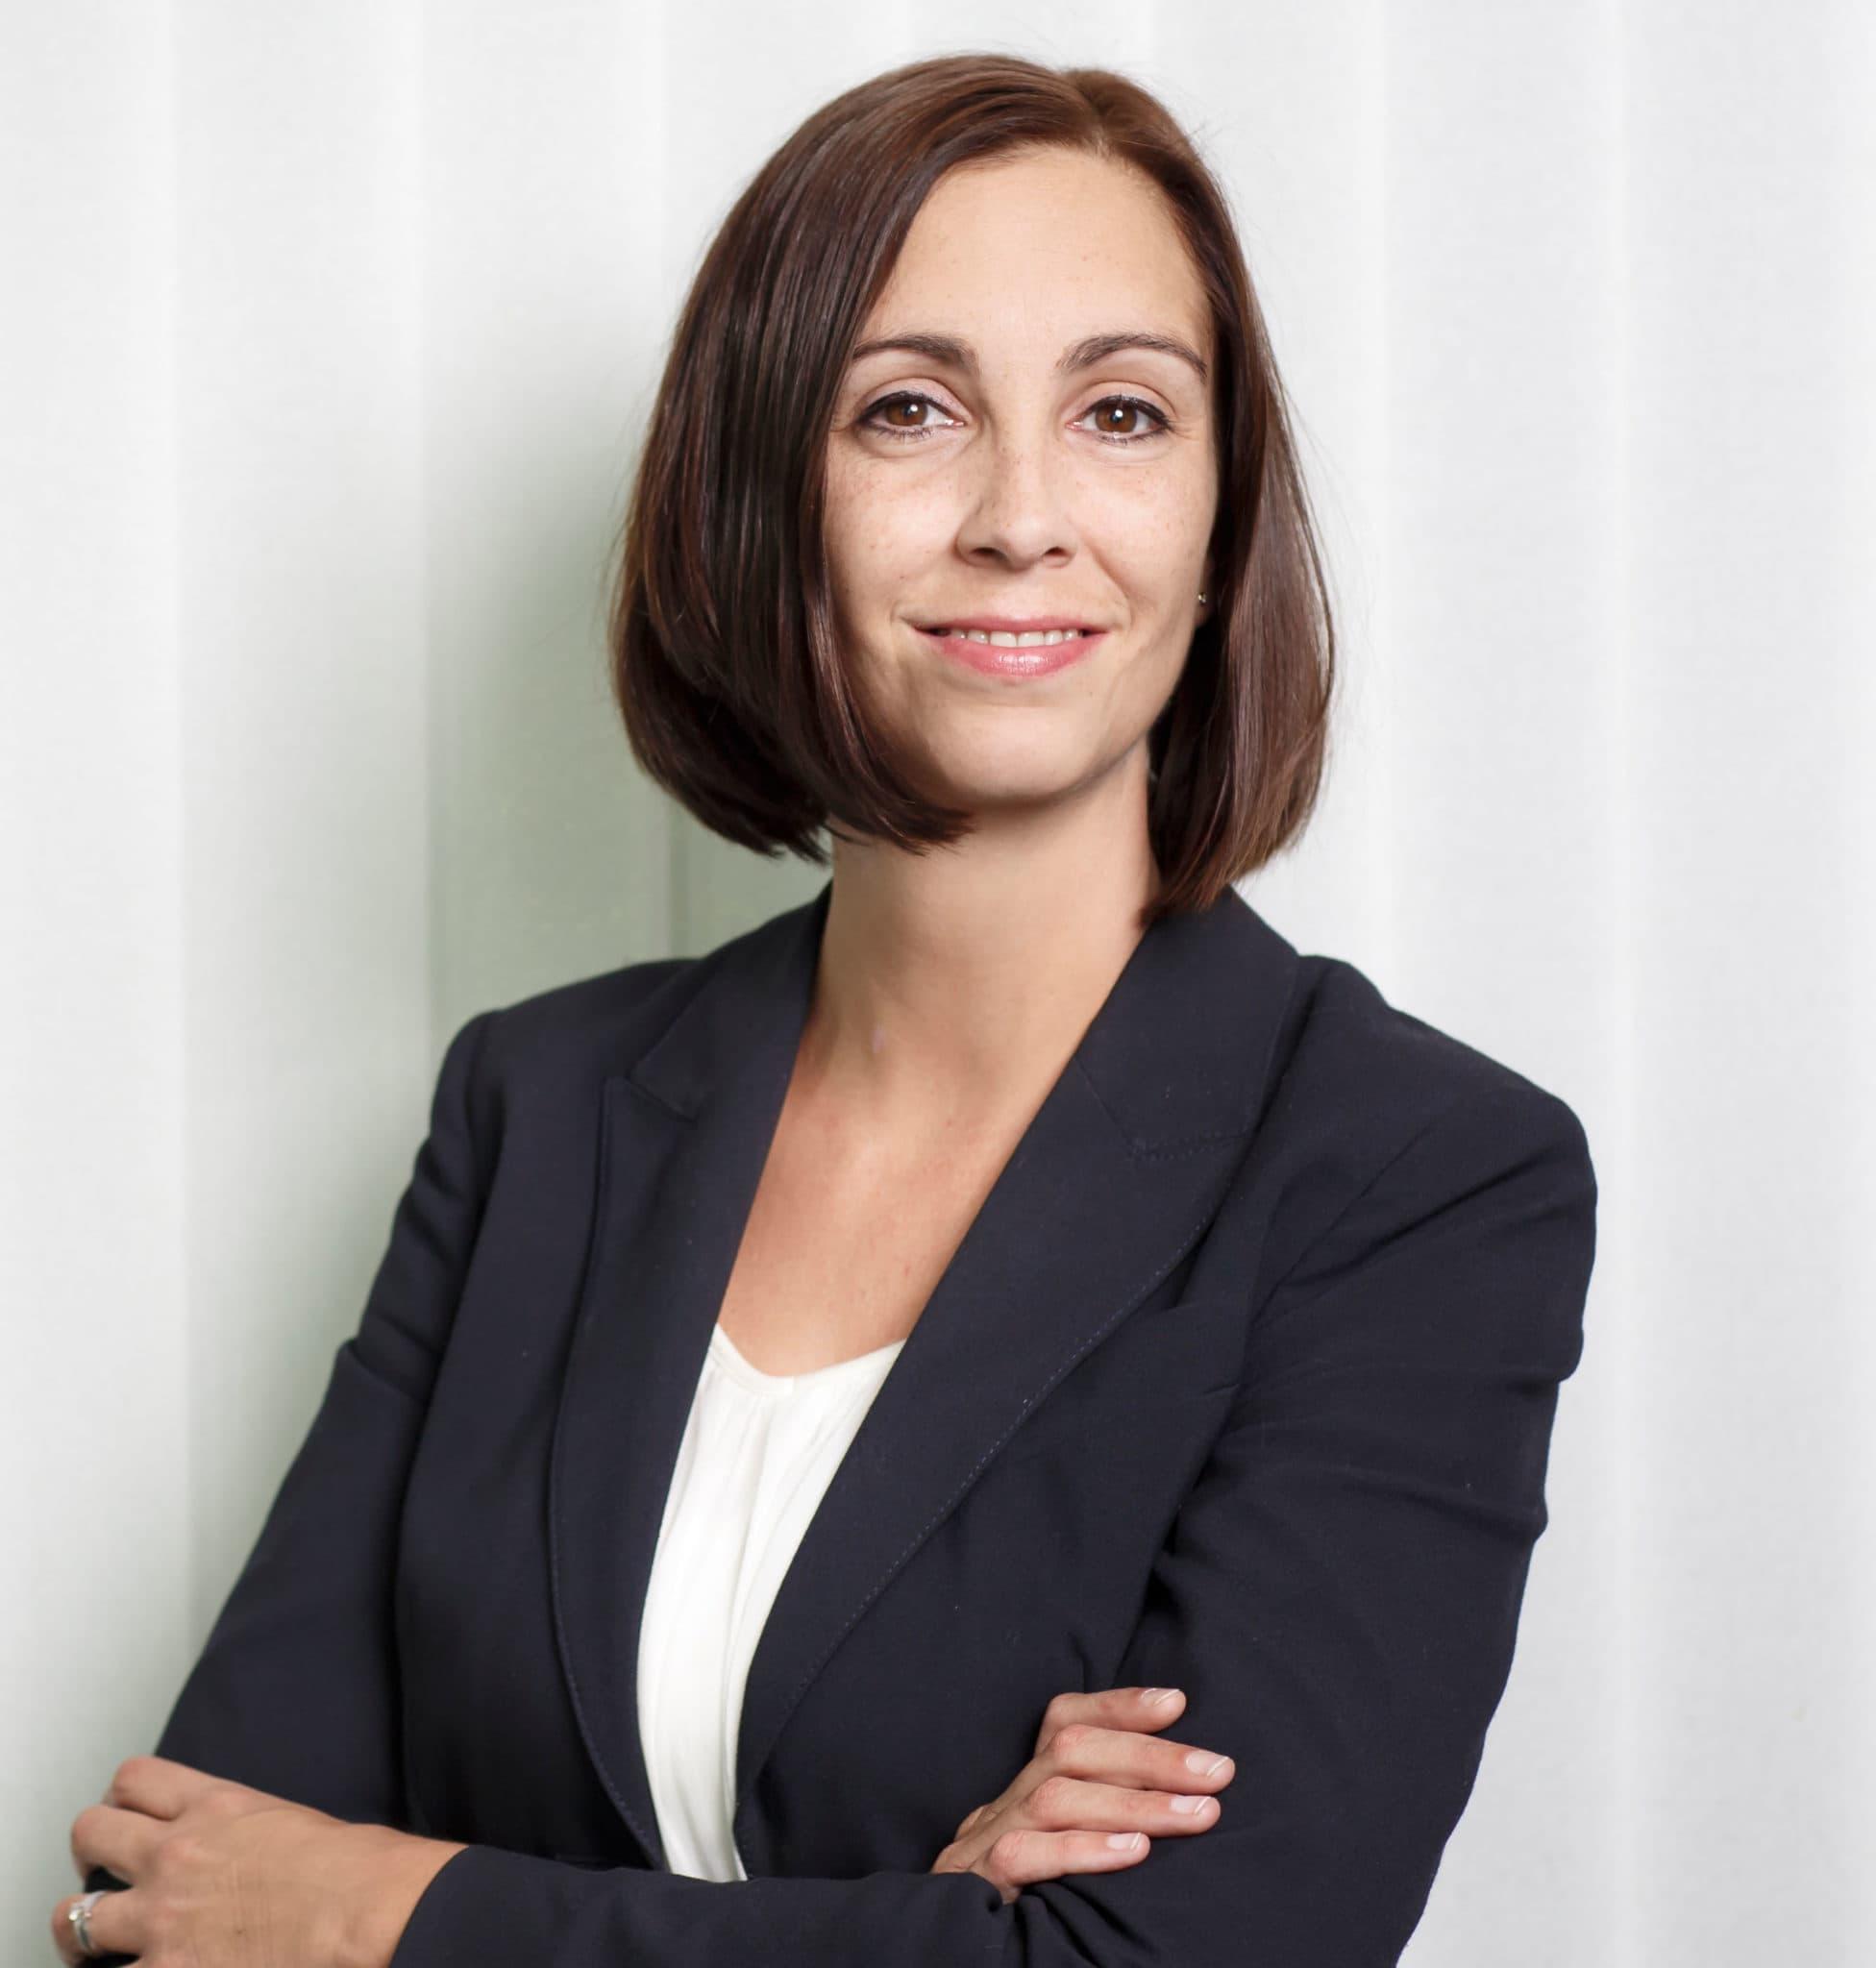 Barbara Klinser-Kammerzelt